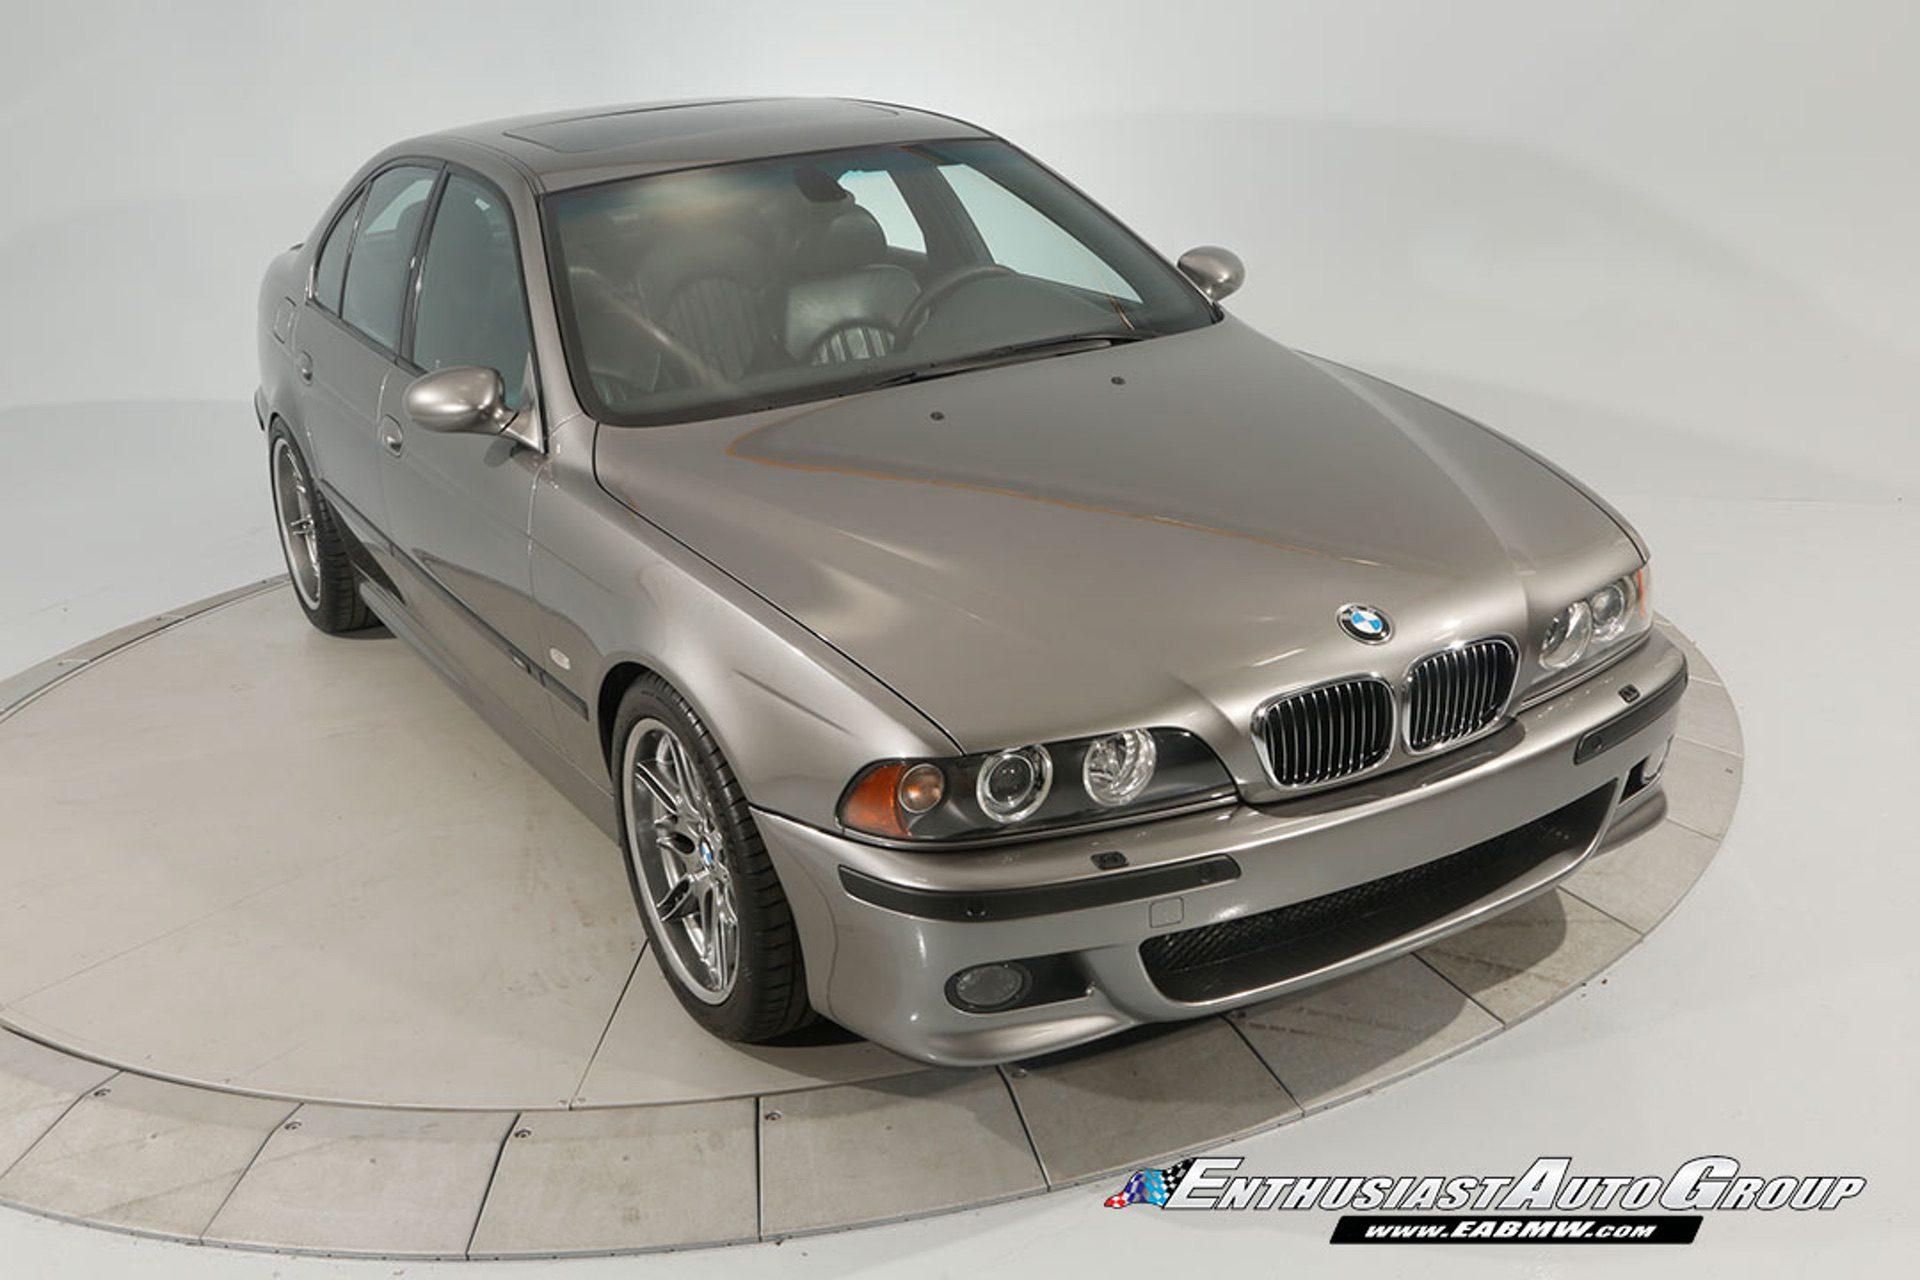 2002 BMW E39 M5 with Dinan Mods 44